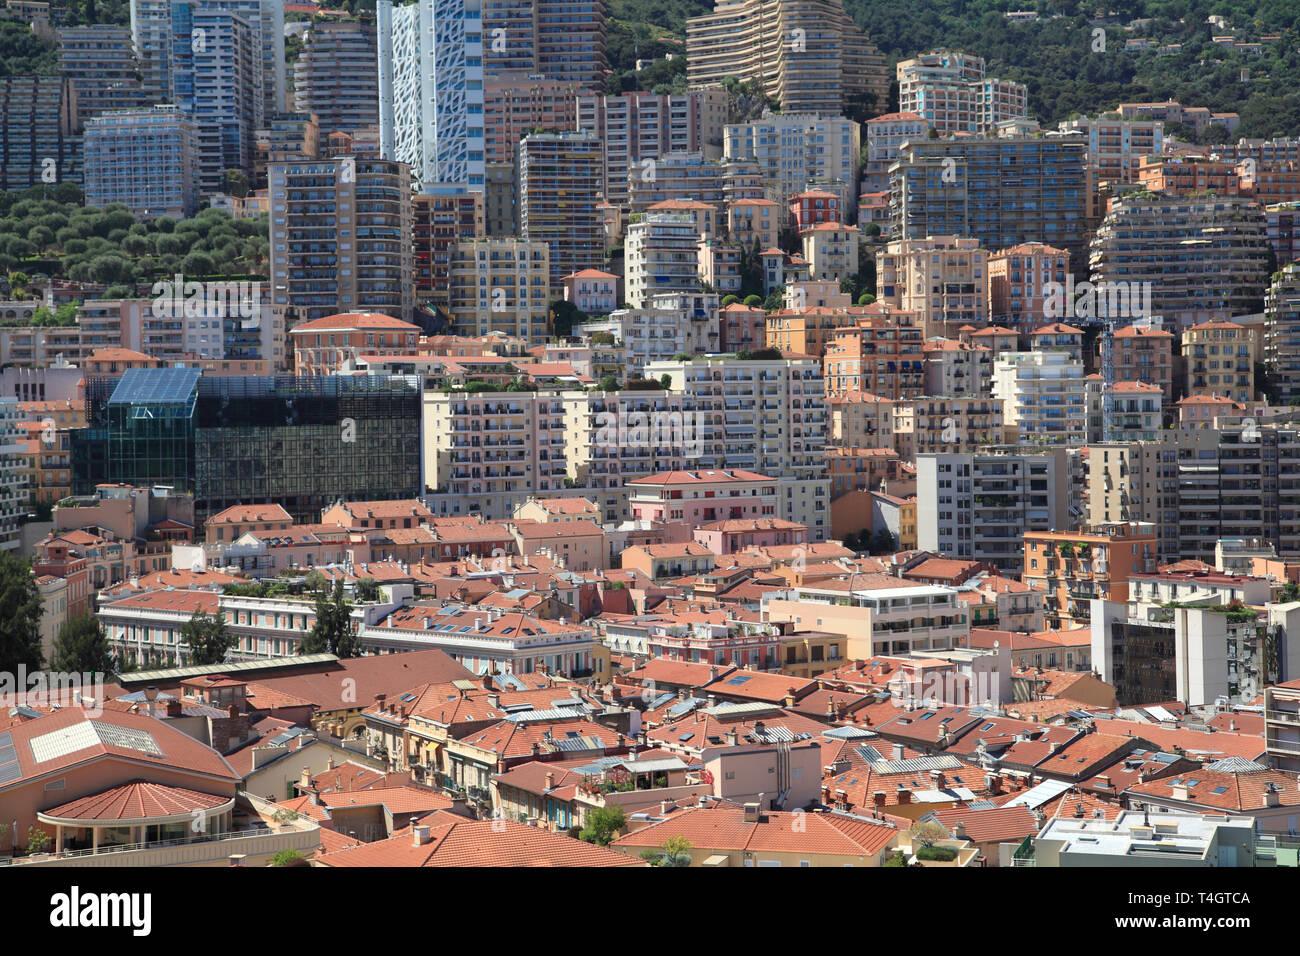 La Condamine, Highrises, Monte Carlo, Monaco, Cote d'Azur, Mediterranean, Europe - Stock Image